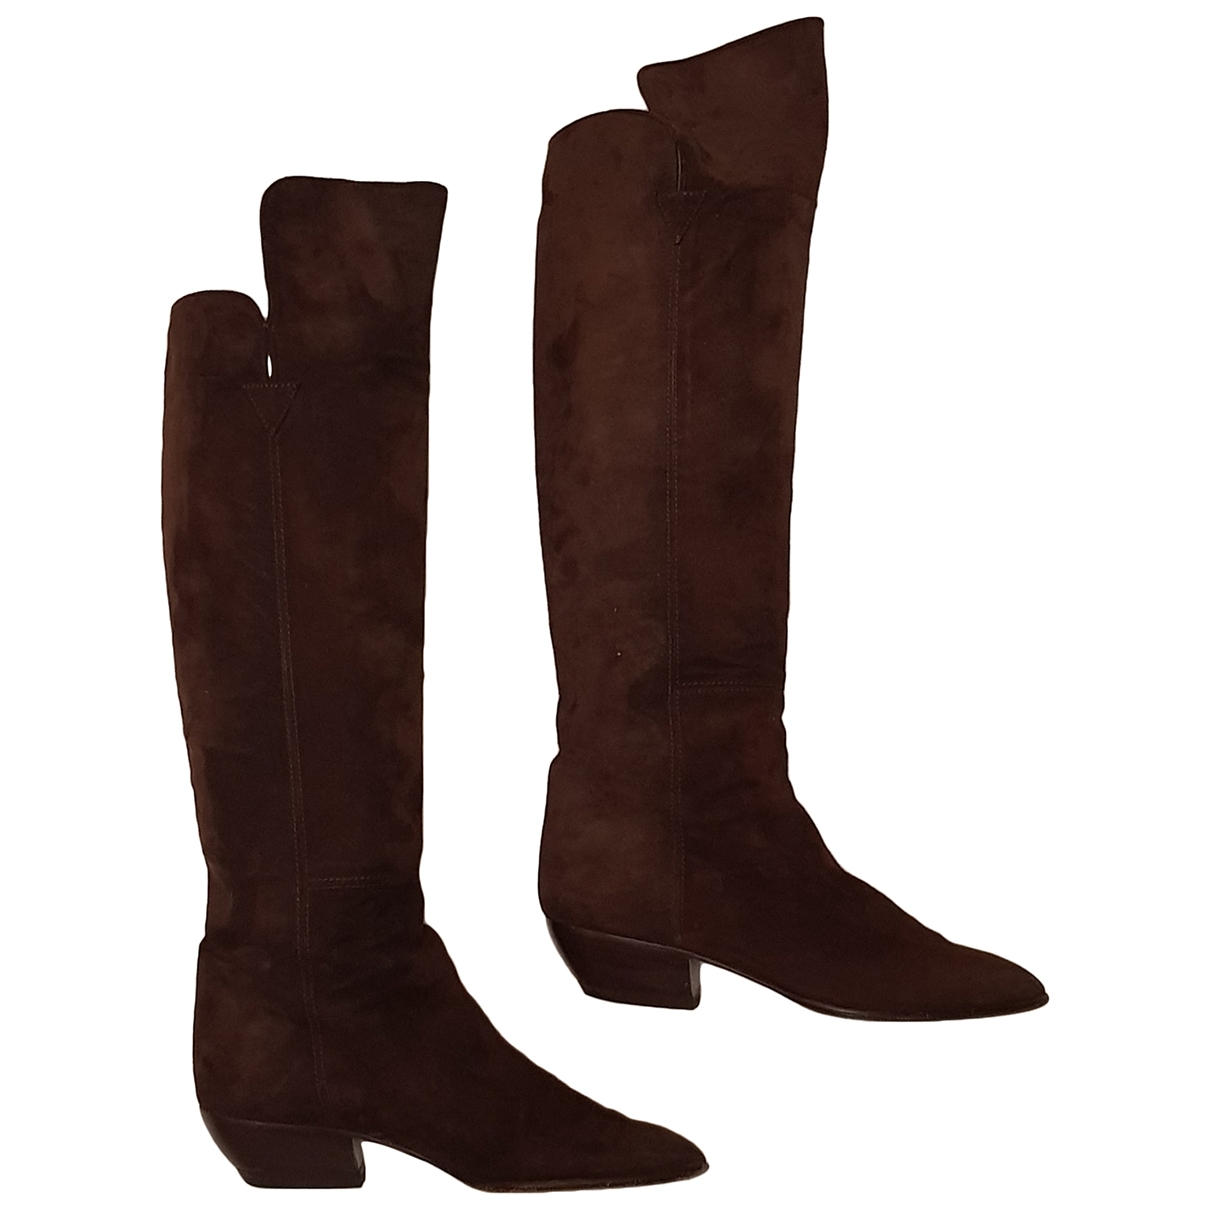 Walter Steiger \N Brown Suede Boots for Women 37.5 EU